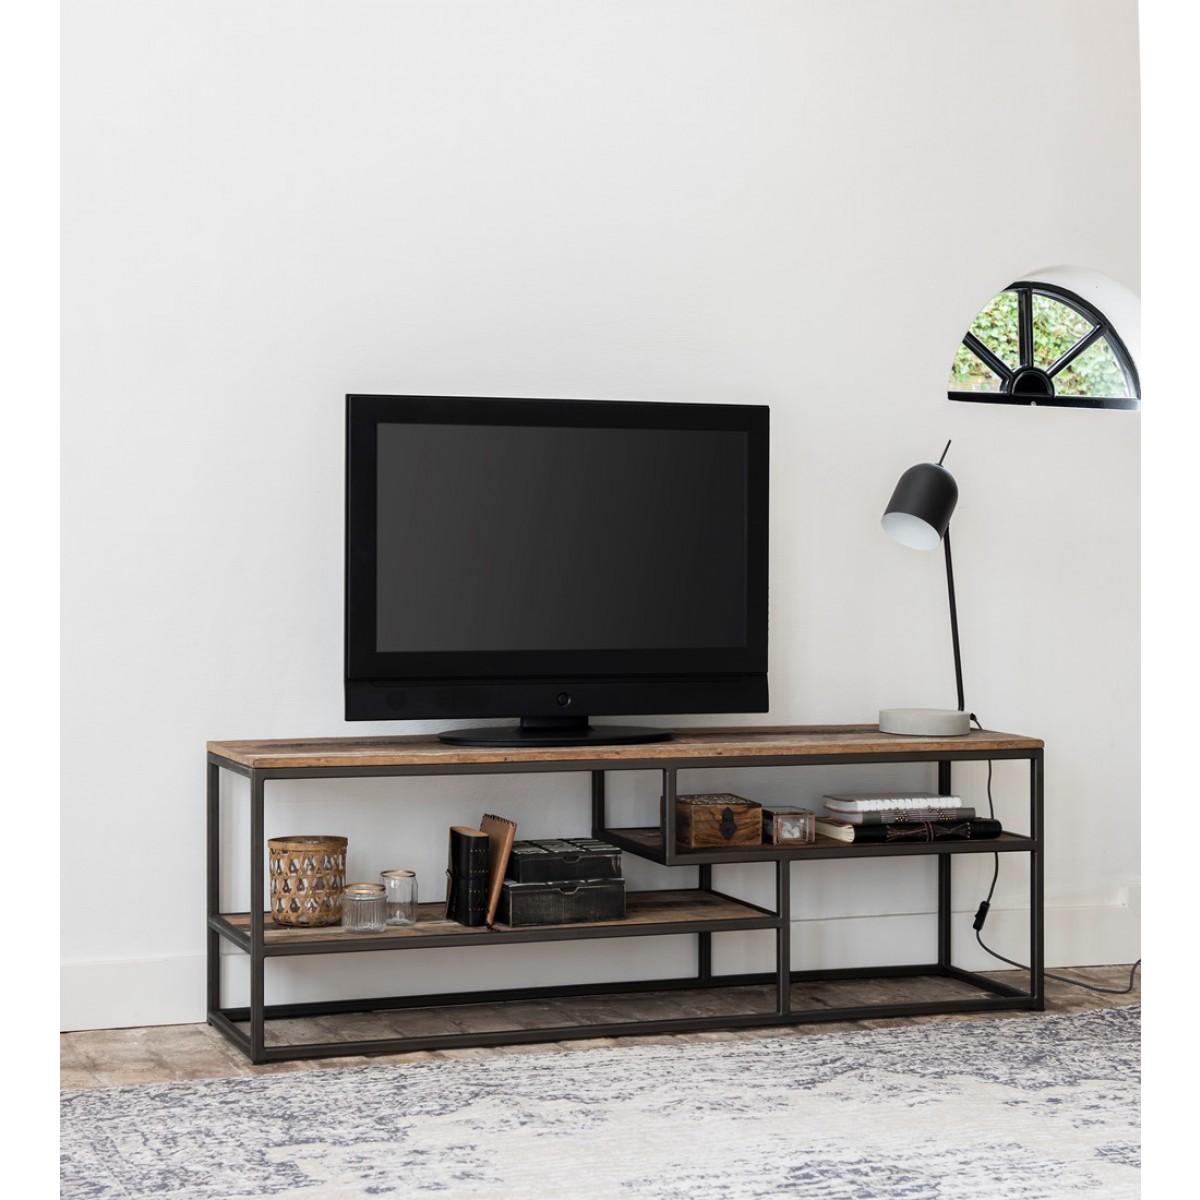 tuareg-dbhodi-tv-meubel-no2-50x125x35-cm-miltonhouse